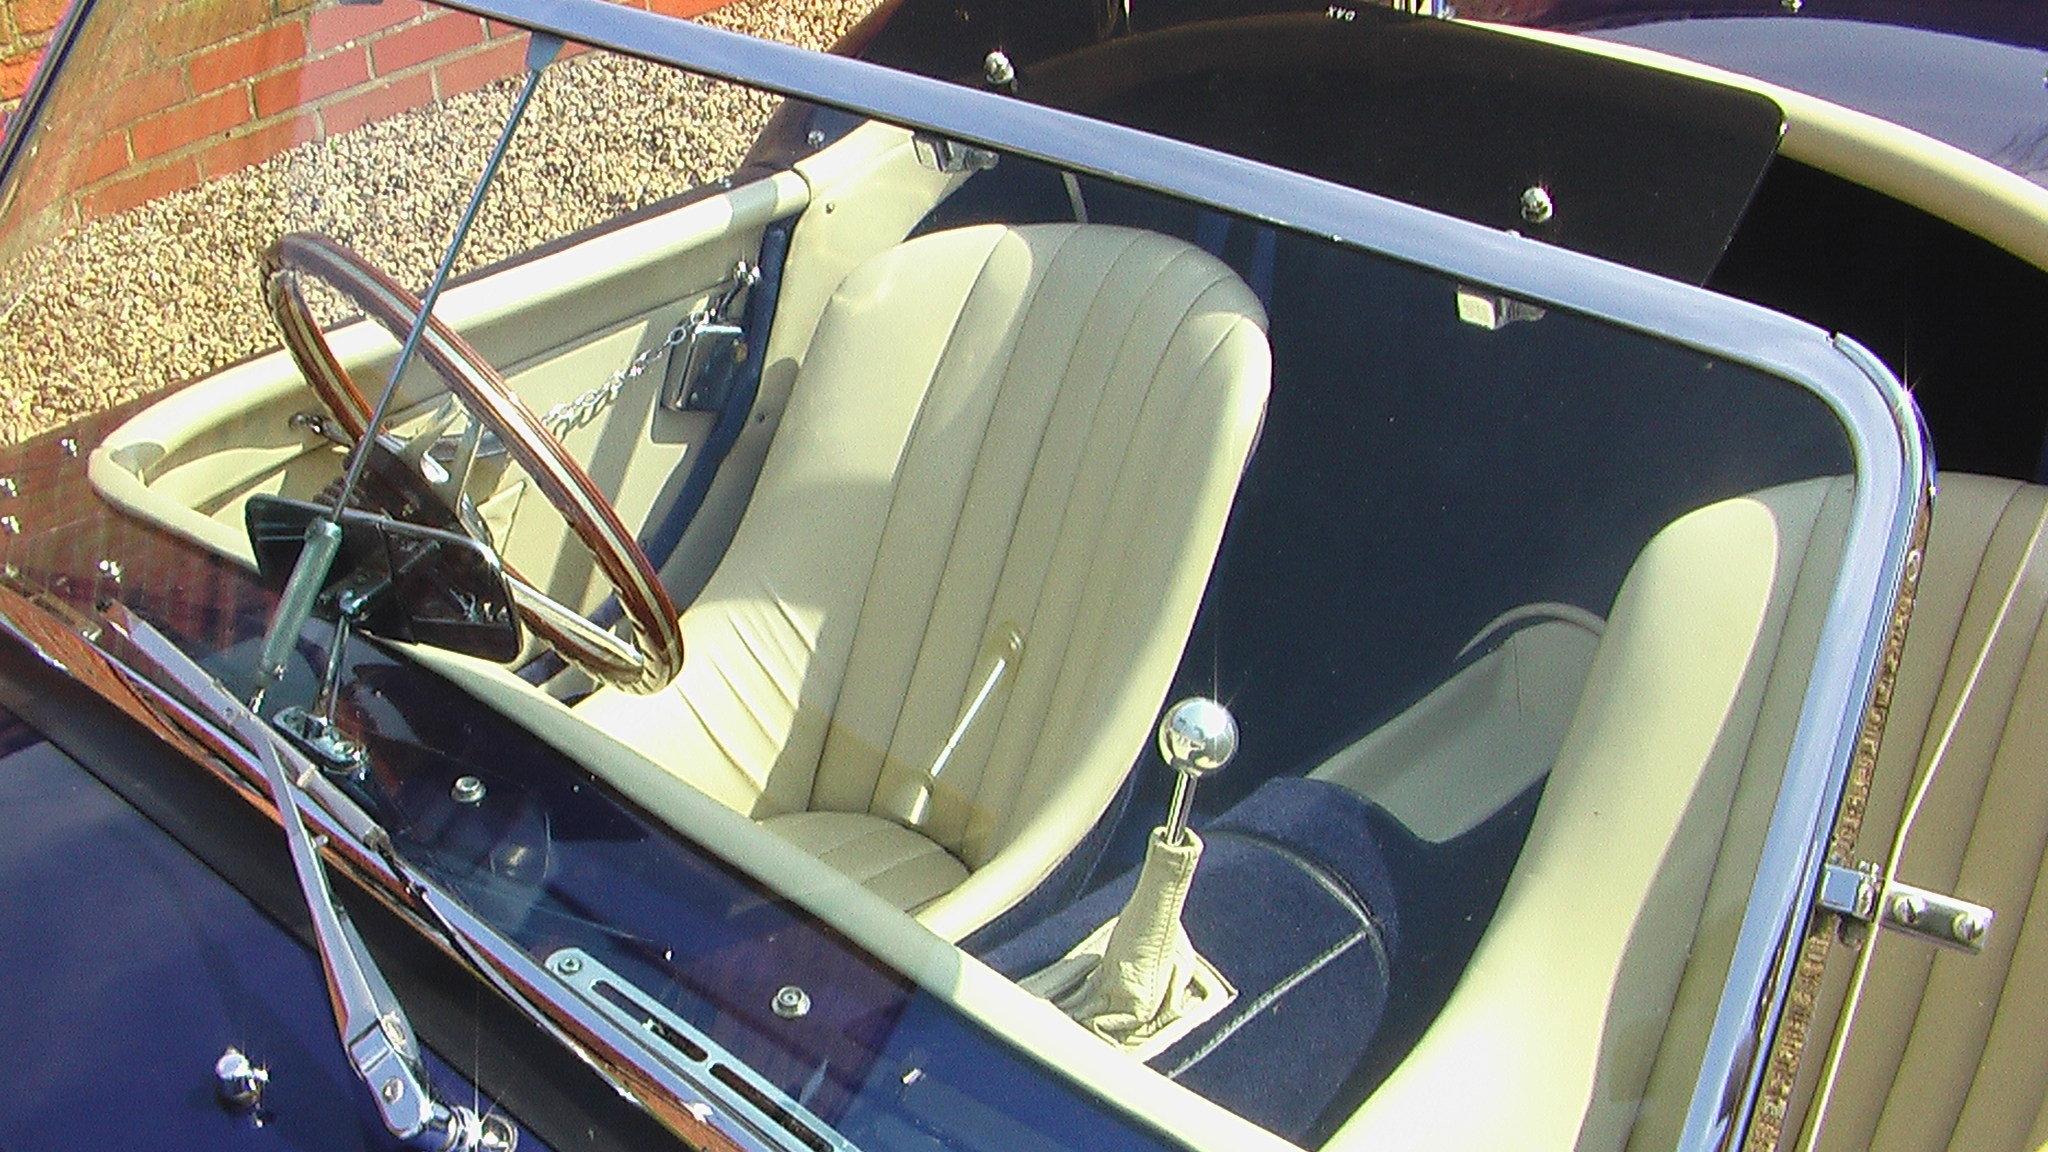 1998 6.5L CHEVY V8, DAX TOJEIRO COBRA For Sale (picture 5 of 6)